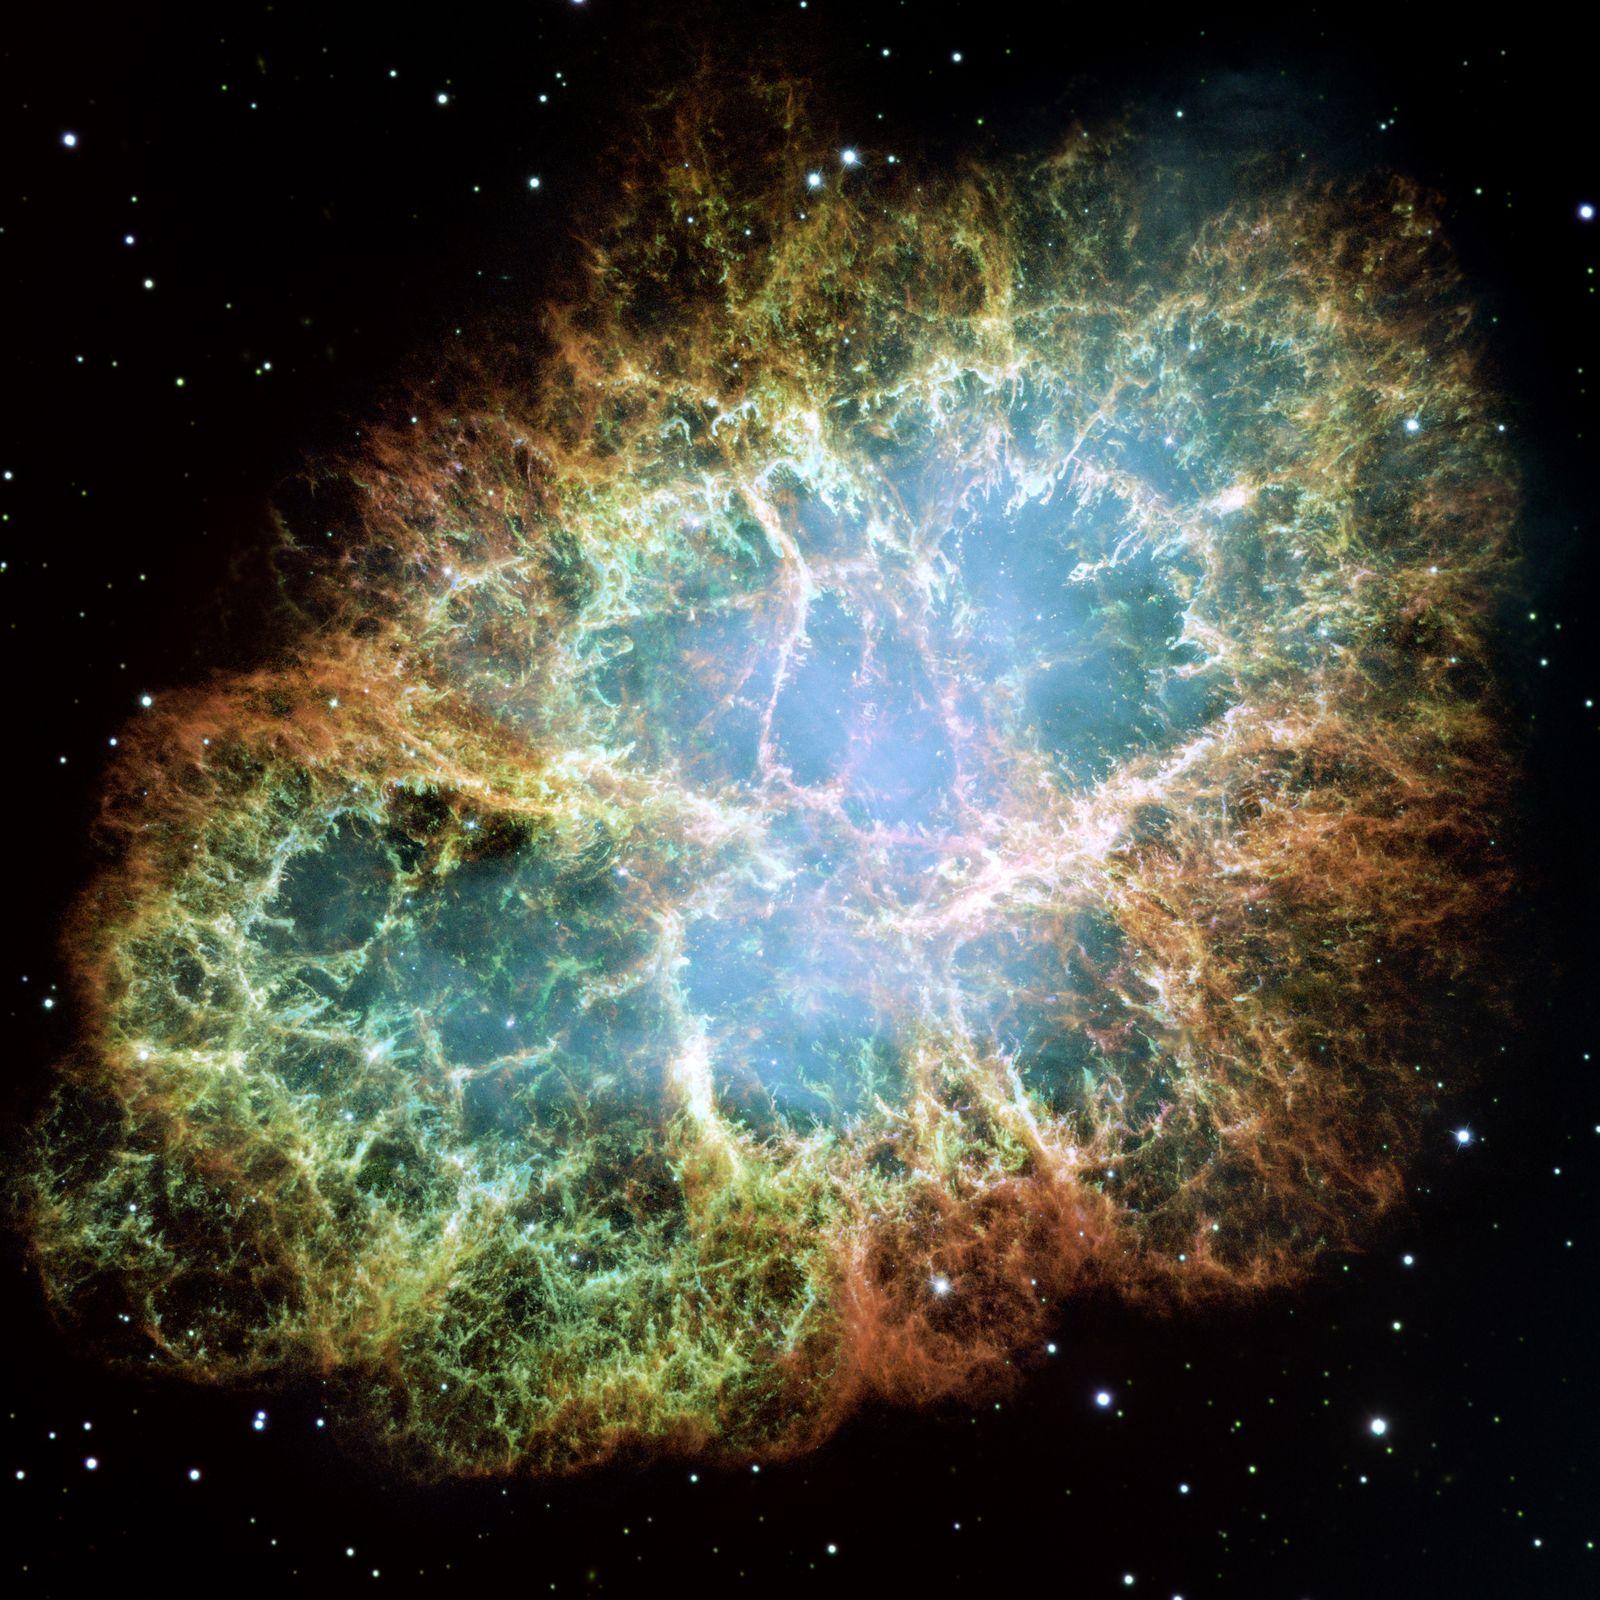 Supernova-Explosionswolke